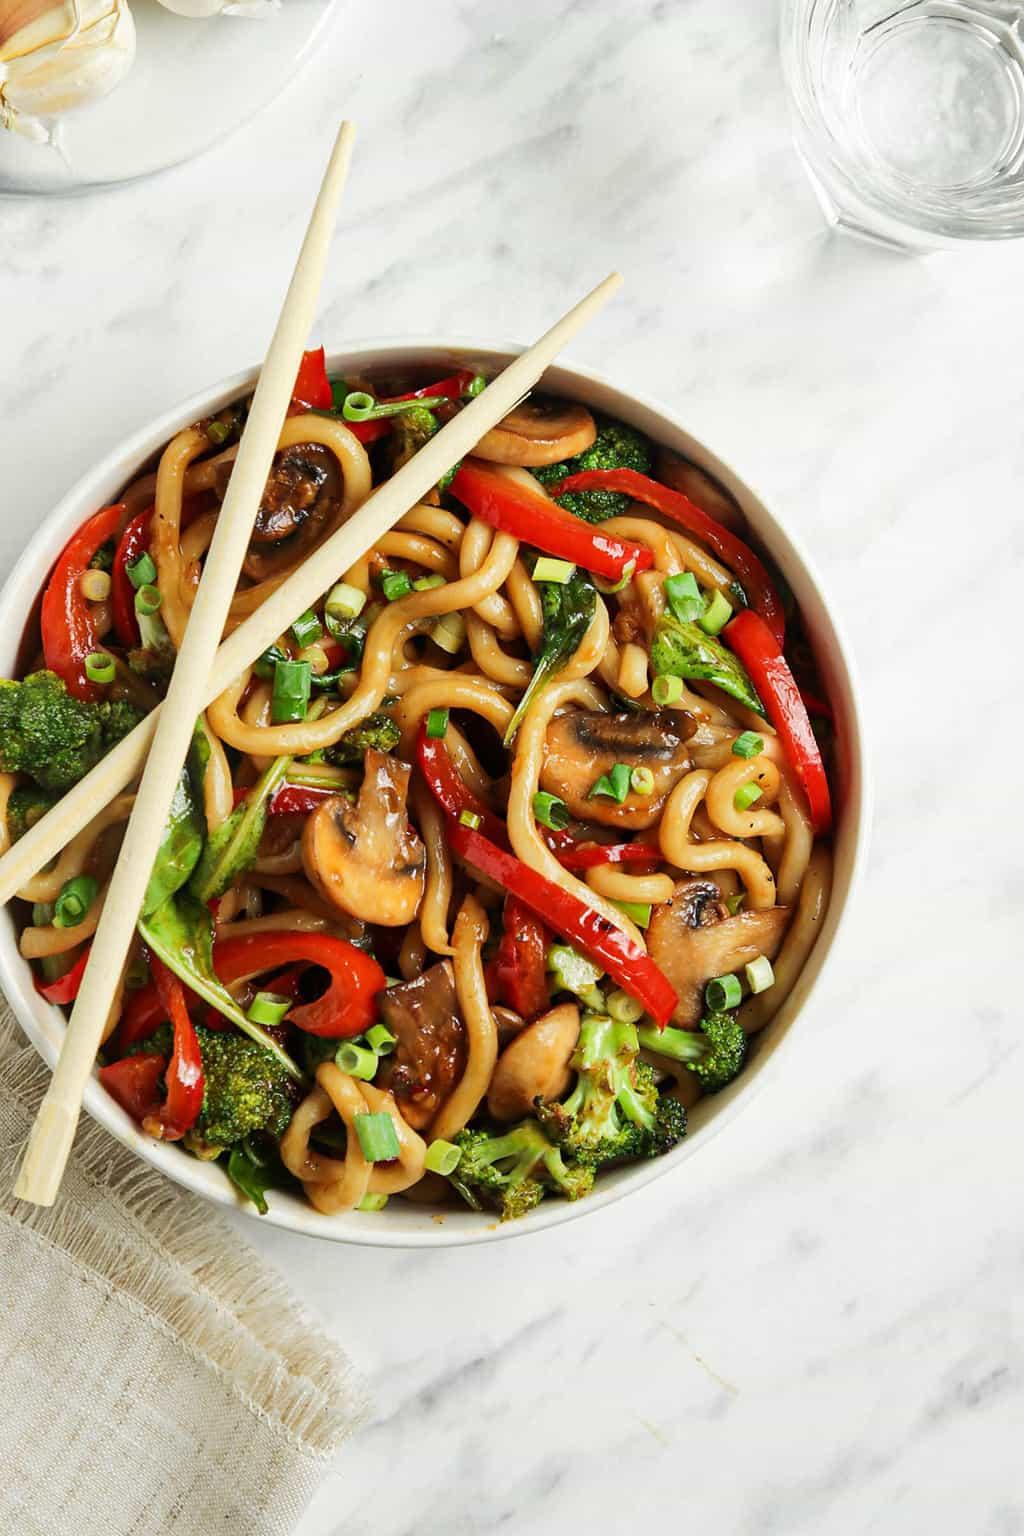 vegan yaki udon in bowl with chopsticks